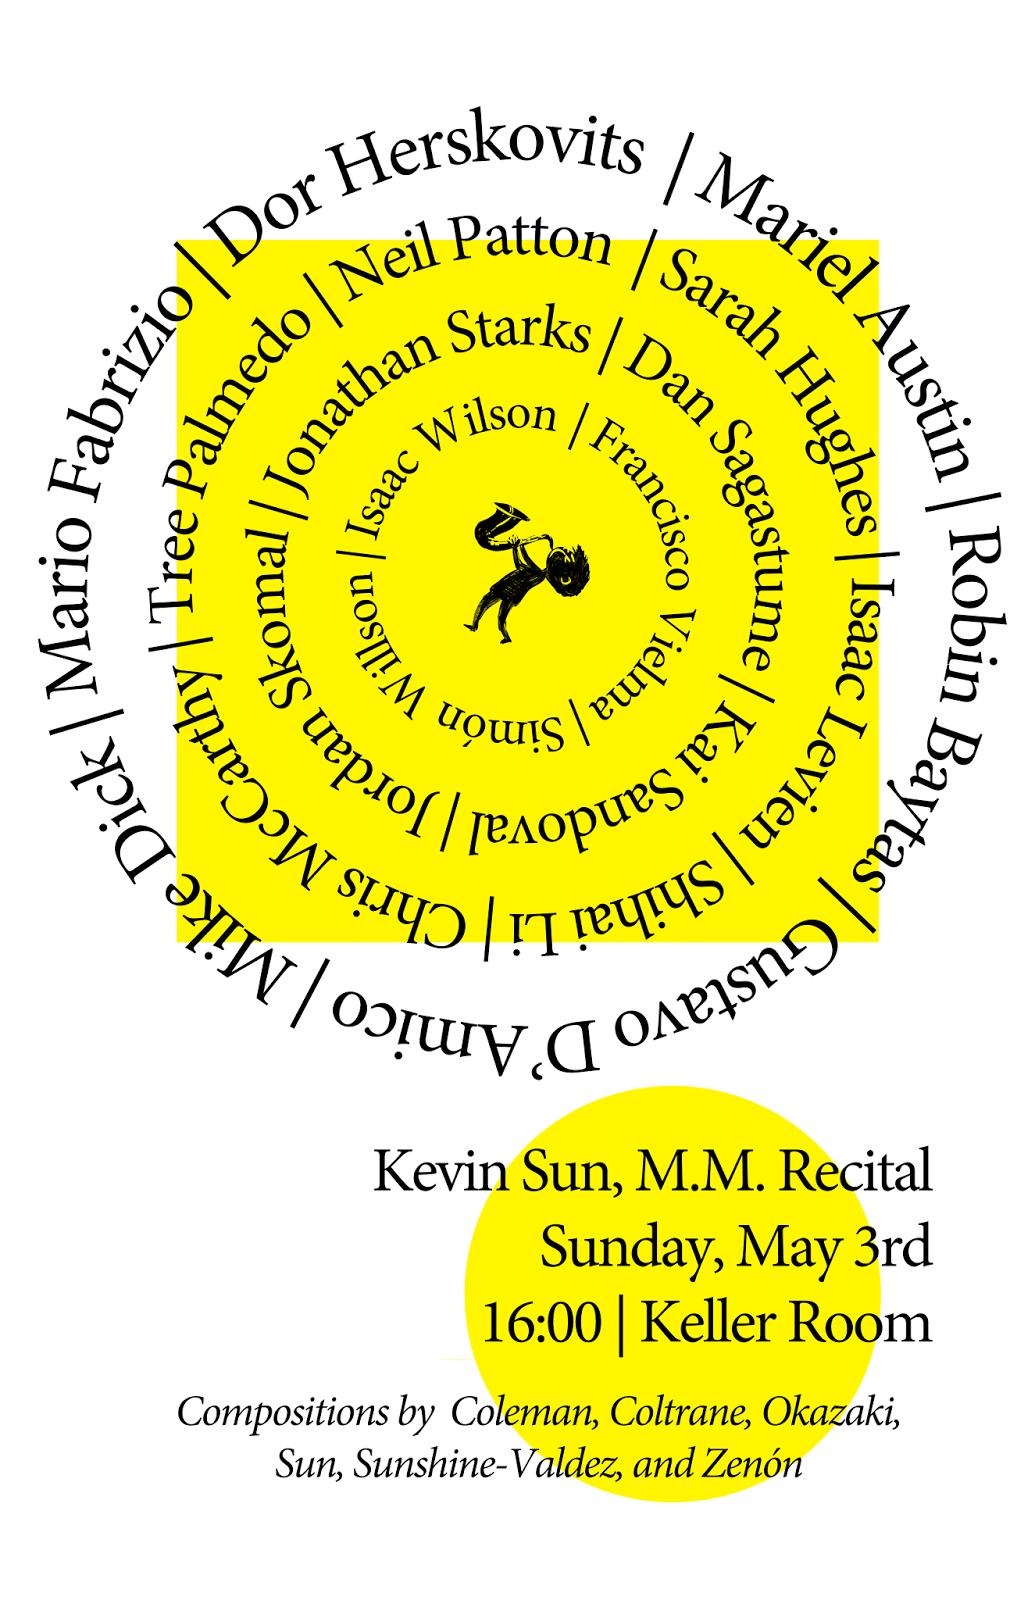 Kevin Sun Jazz Saxophone Recital Poster, New England Conservatory